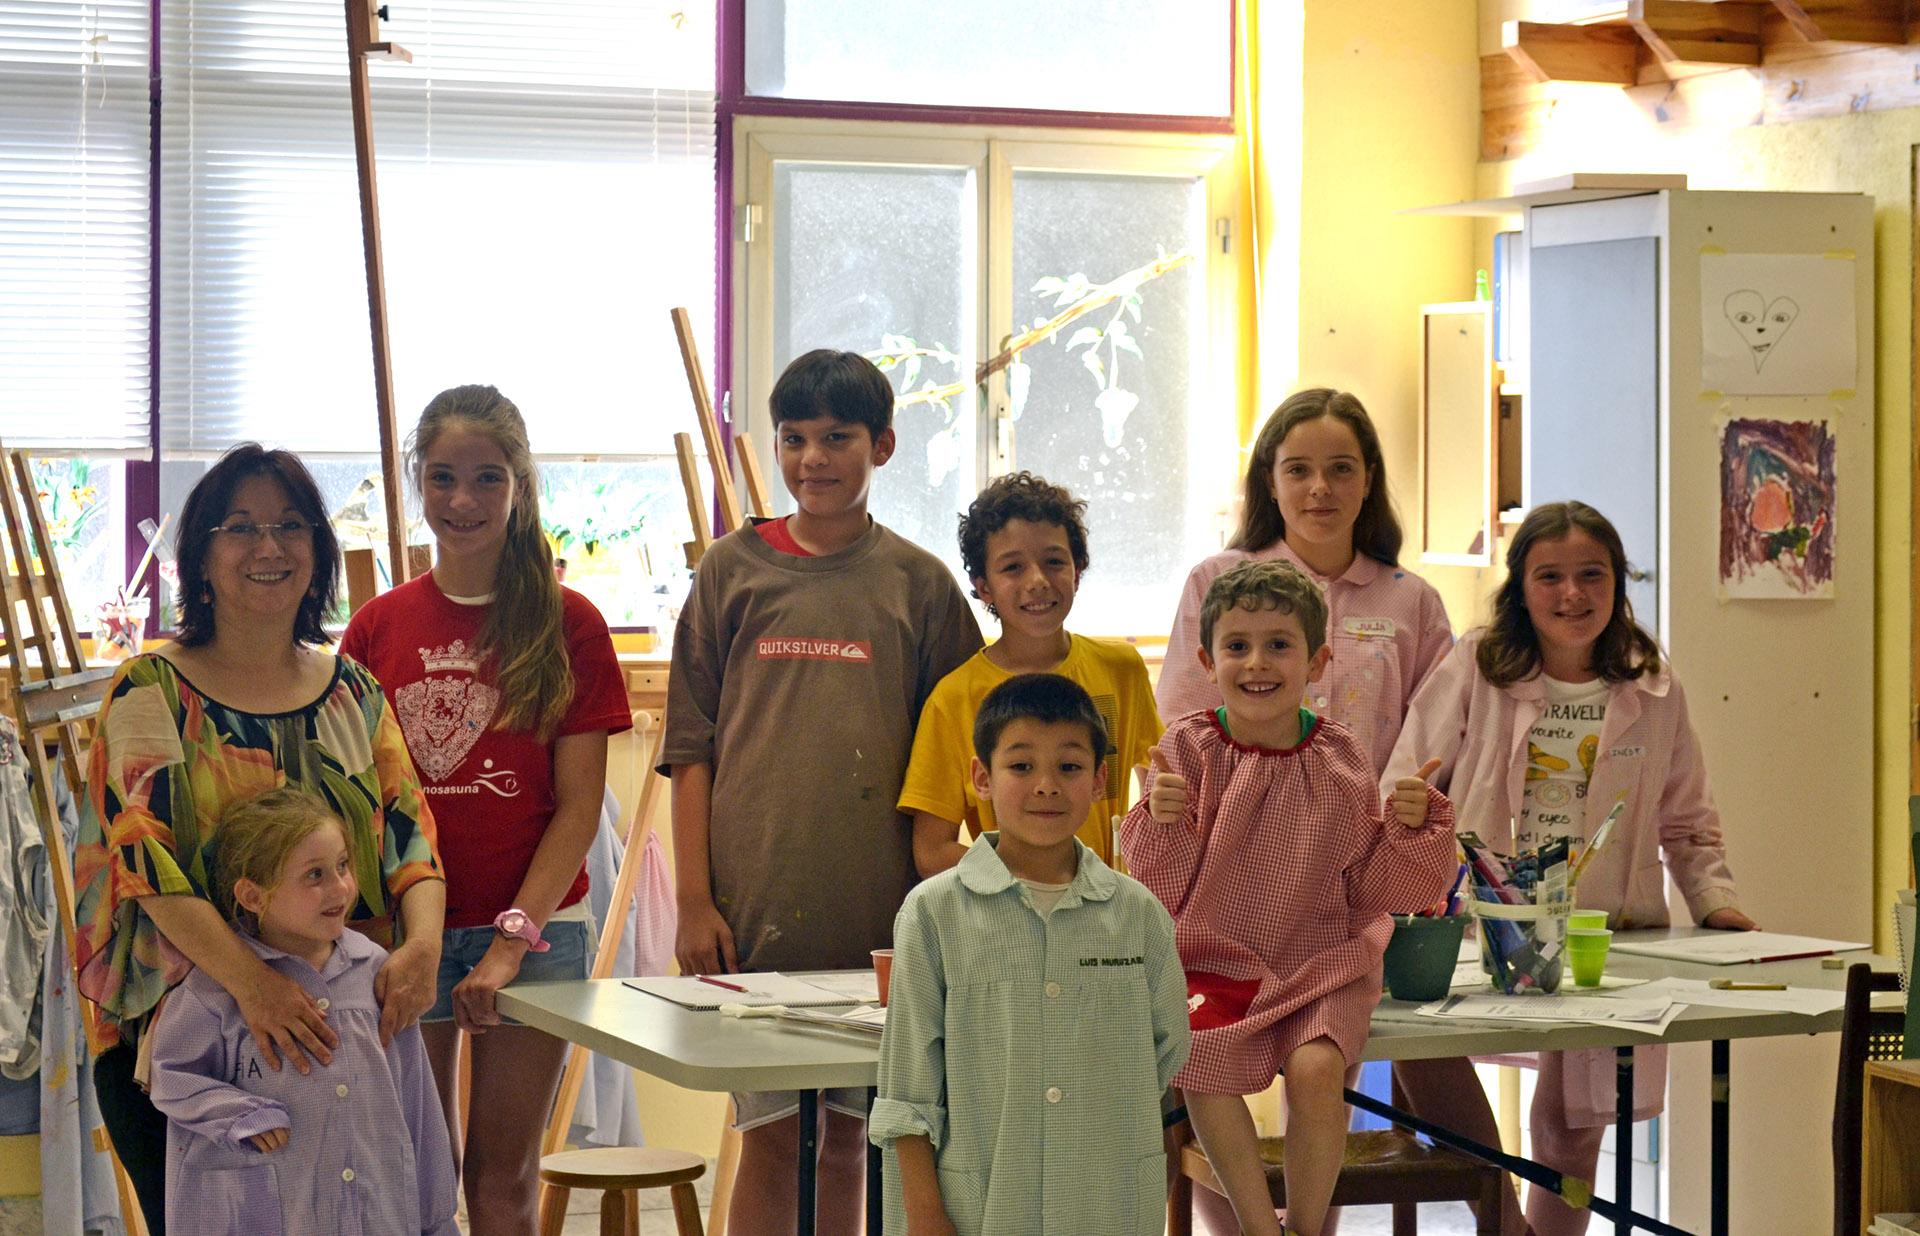 Último día de clase, los peques con Pilar. Taller Aceña-Olmedo, curso 2017-2018